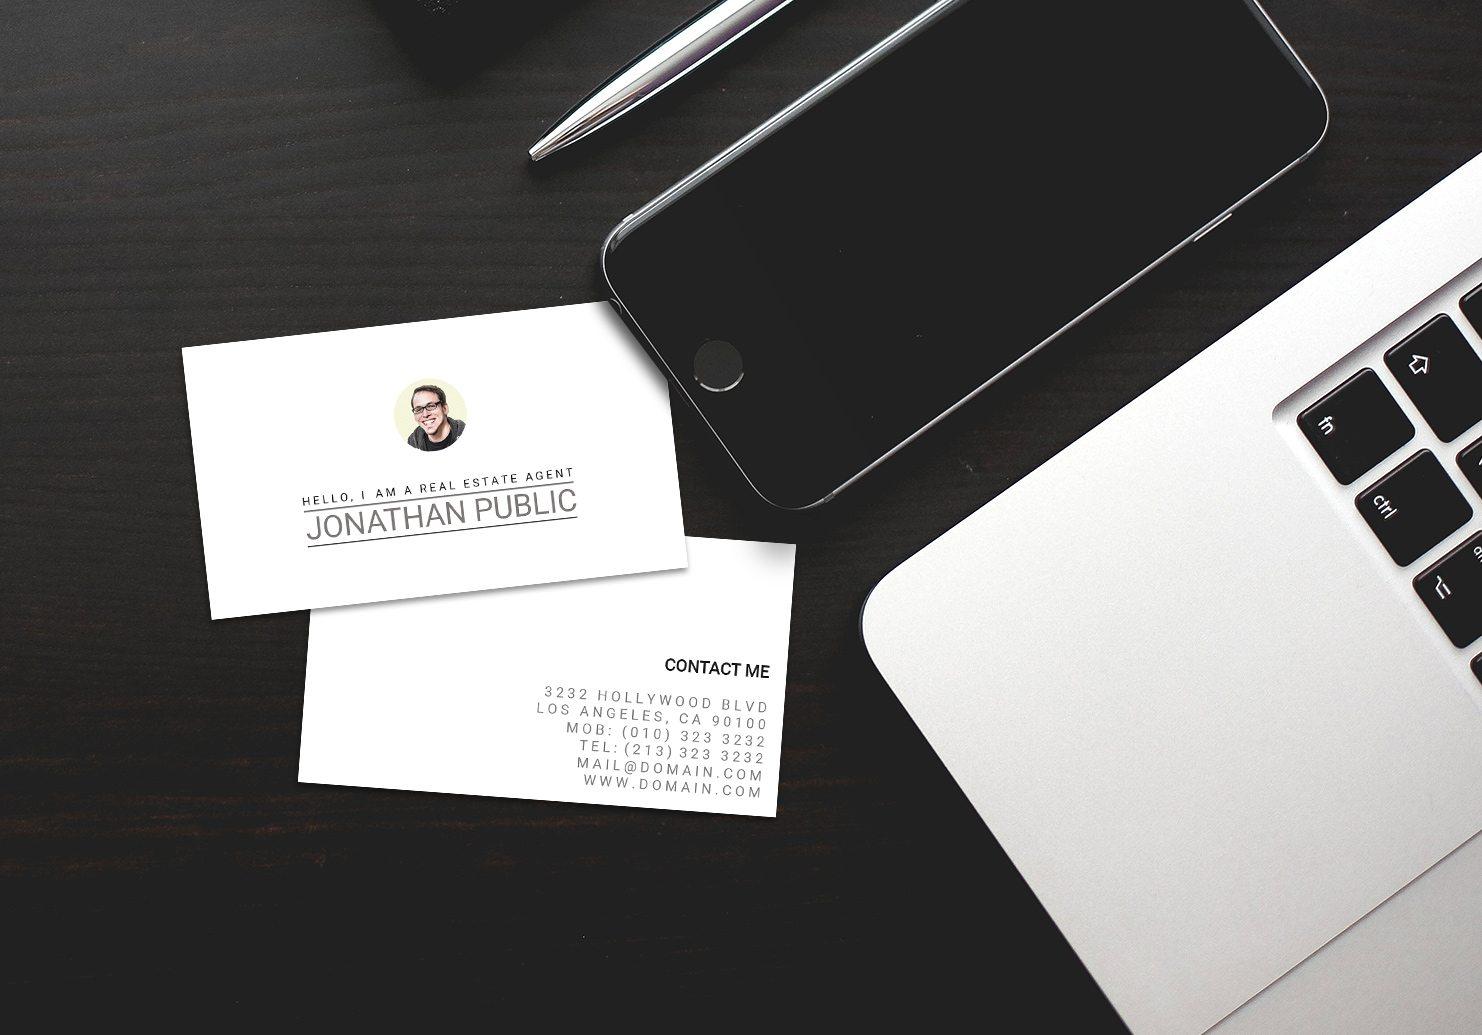 jonathan-public-biz-card